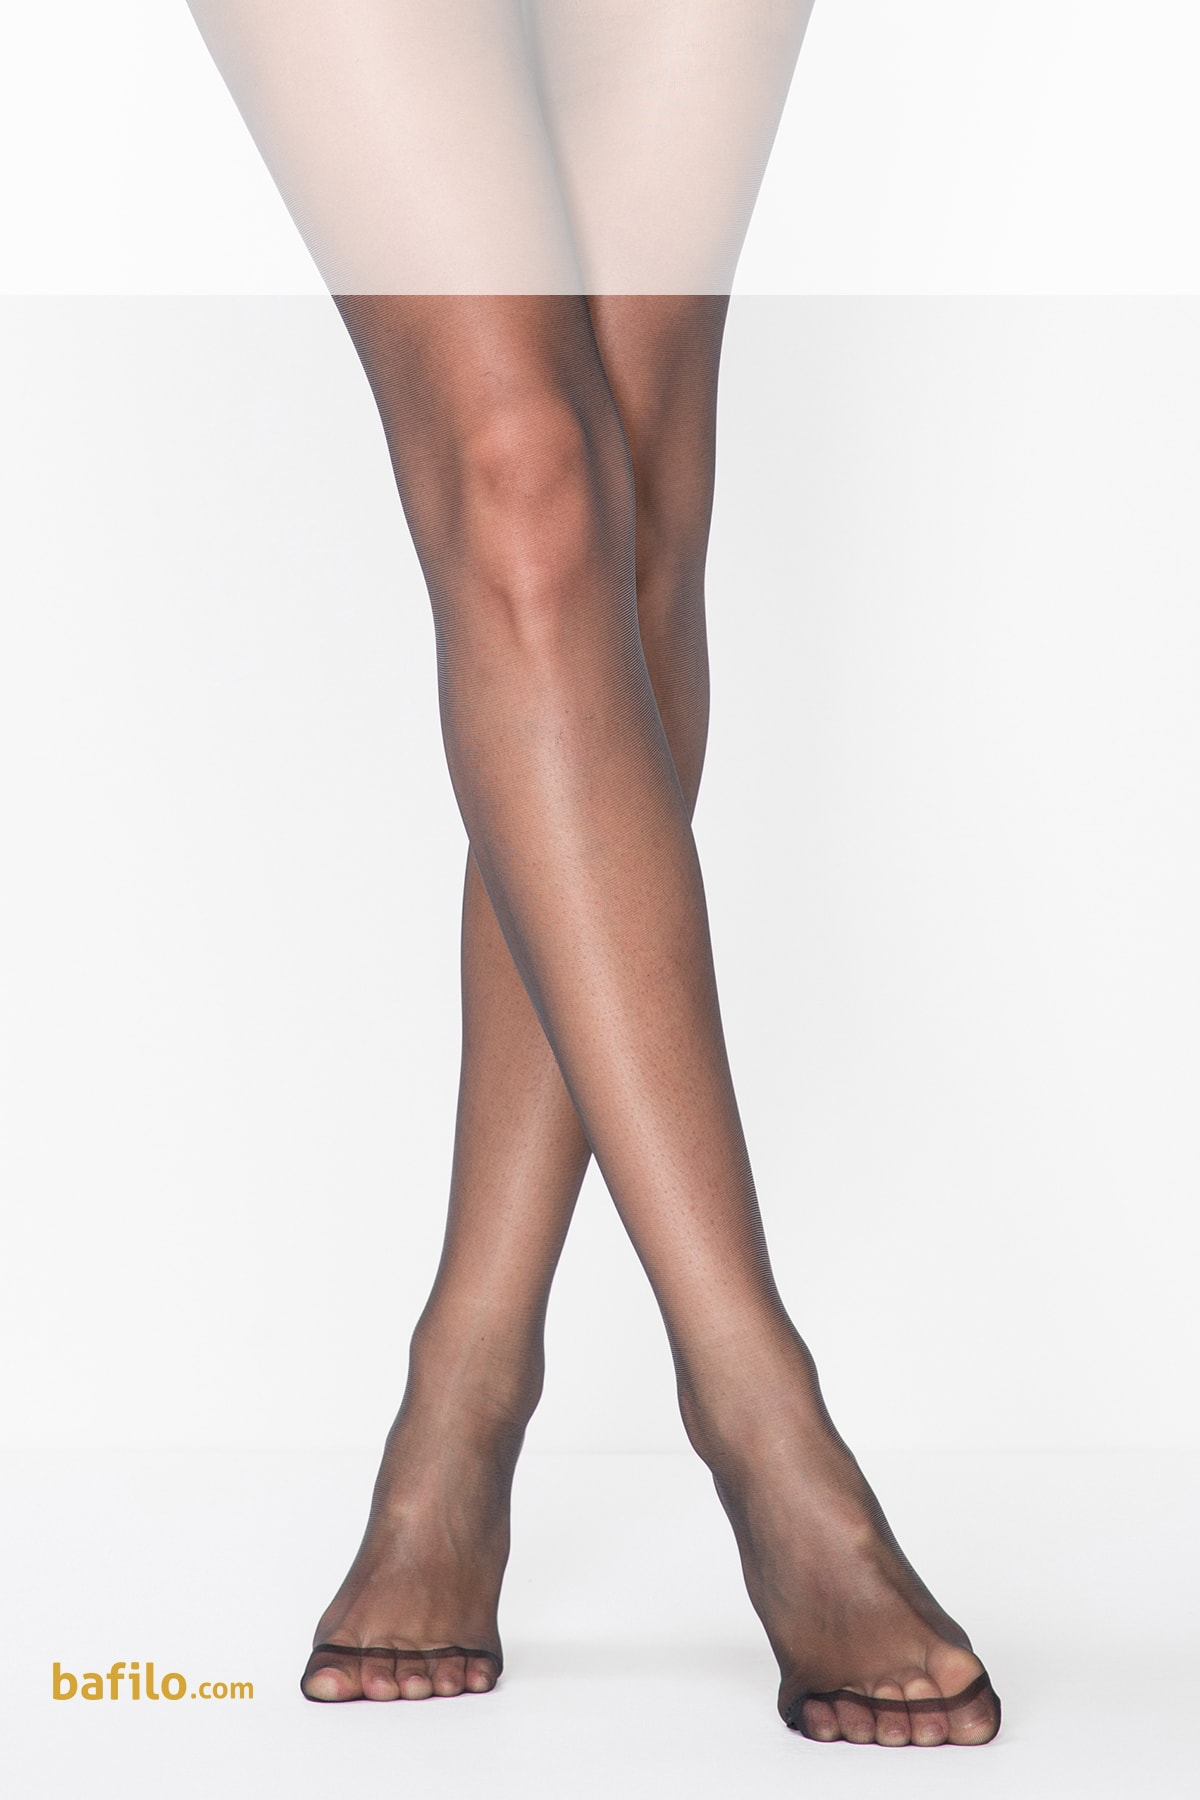 پنتی | Penti - جوراب شلواری نازک زنانه پنتی Mat 20 مشکی